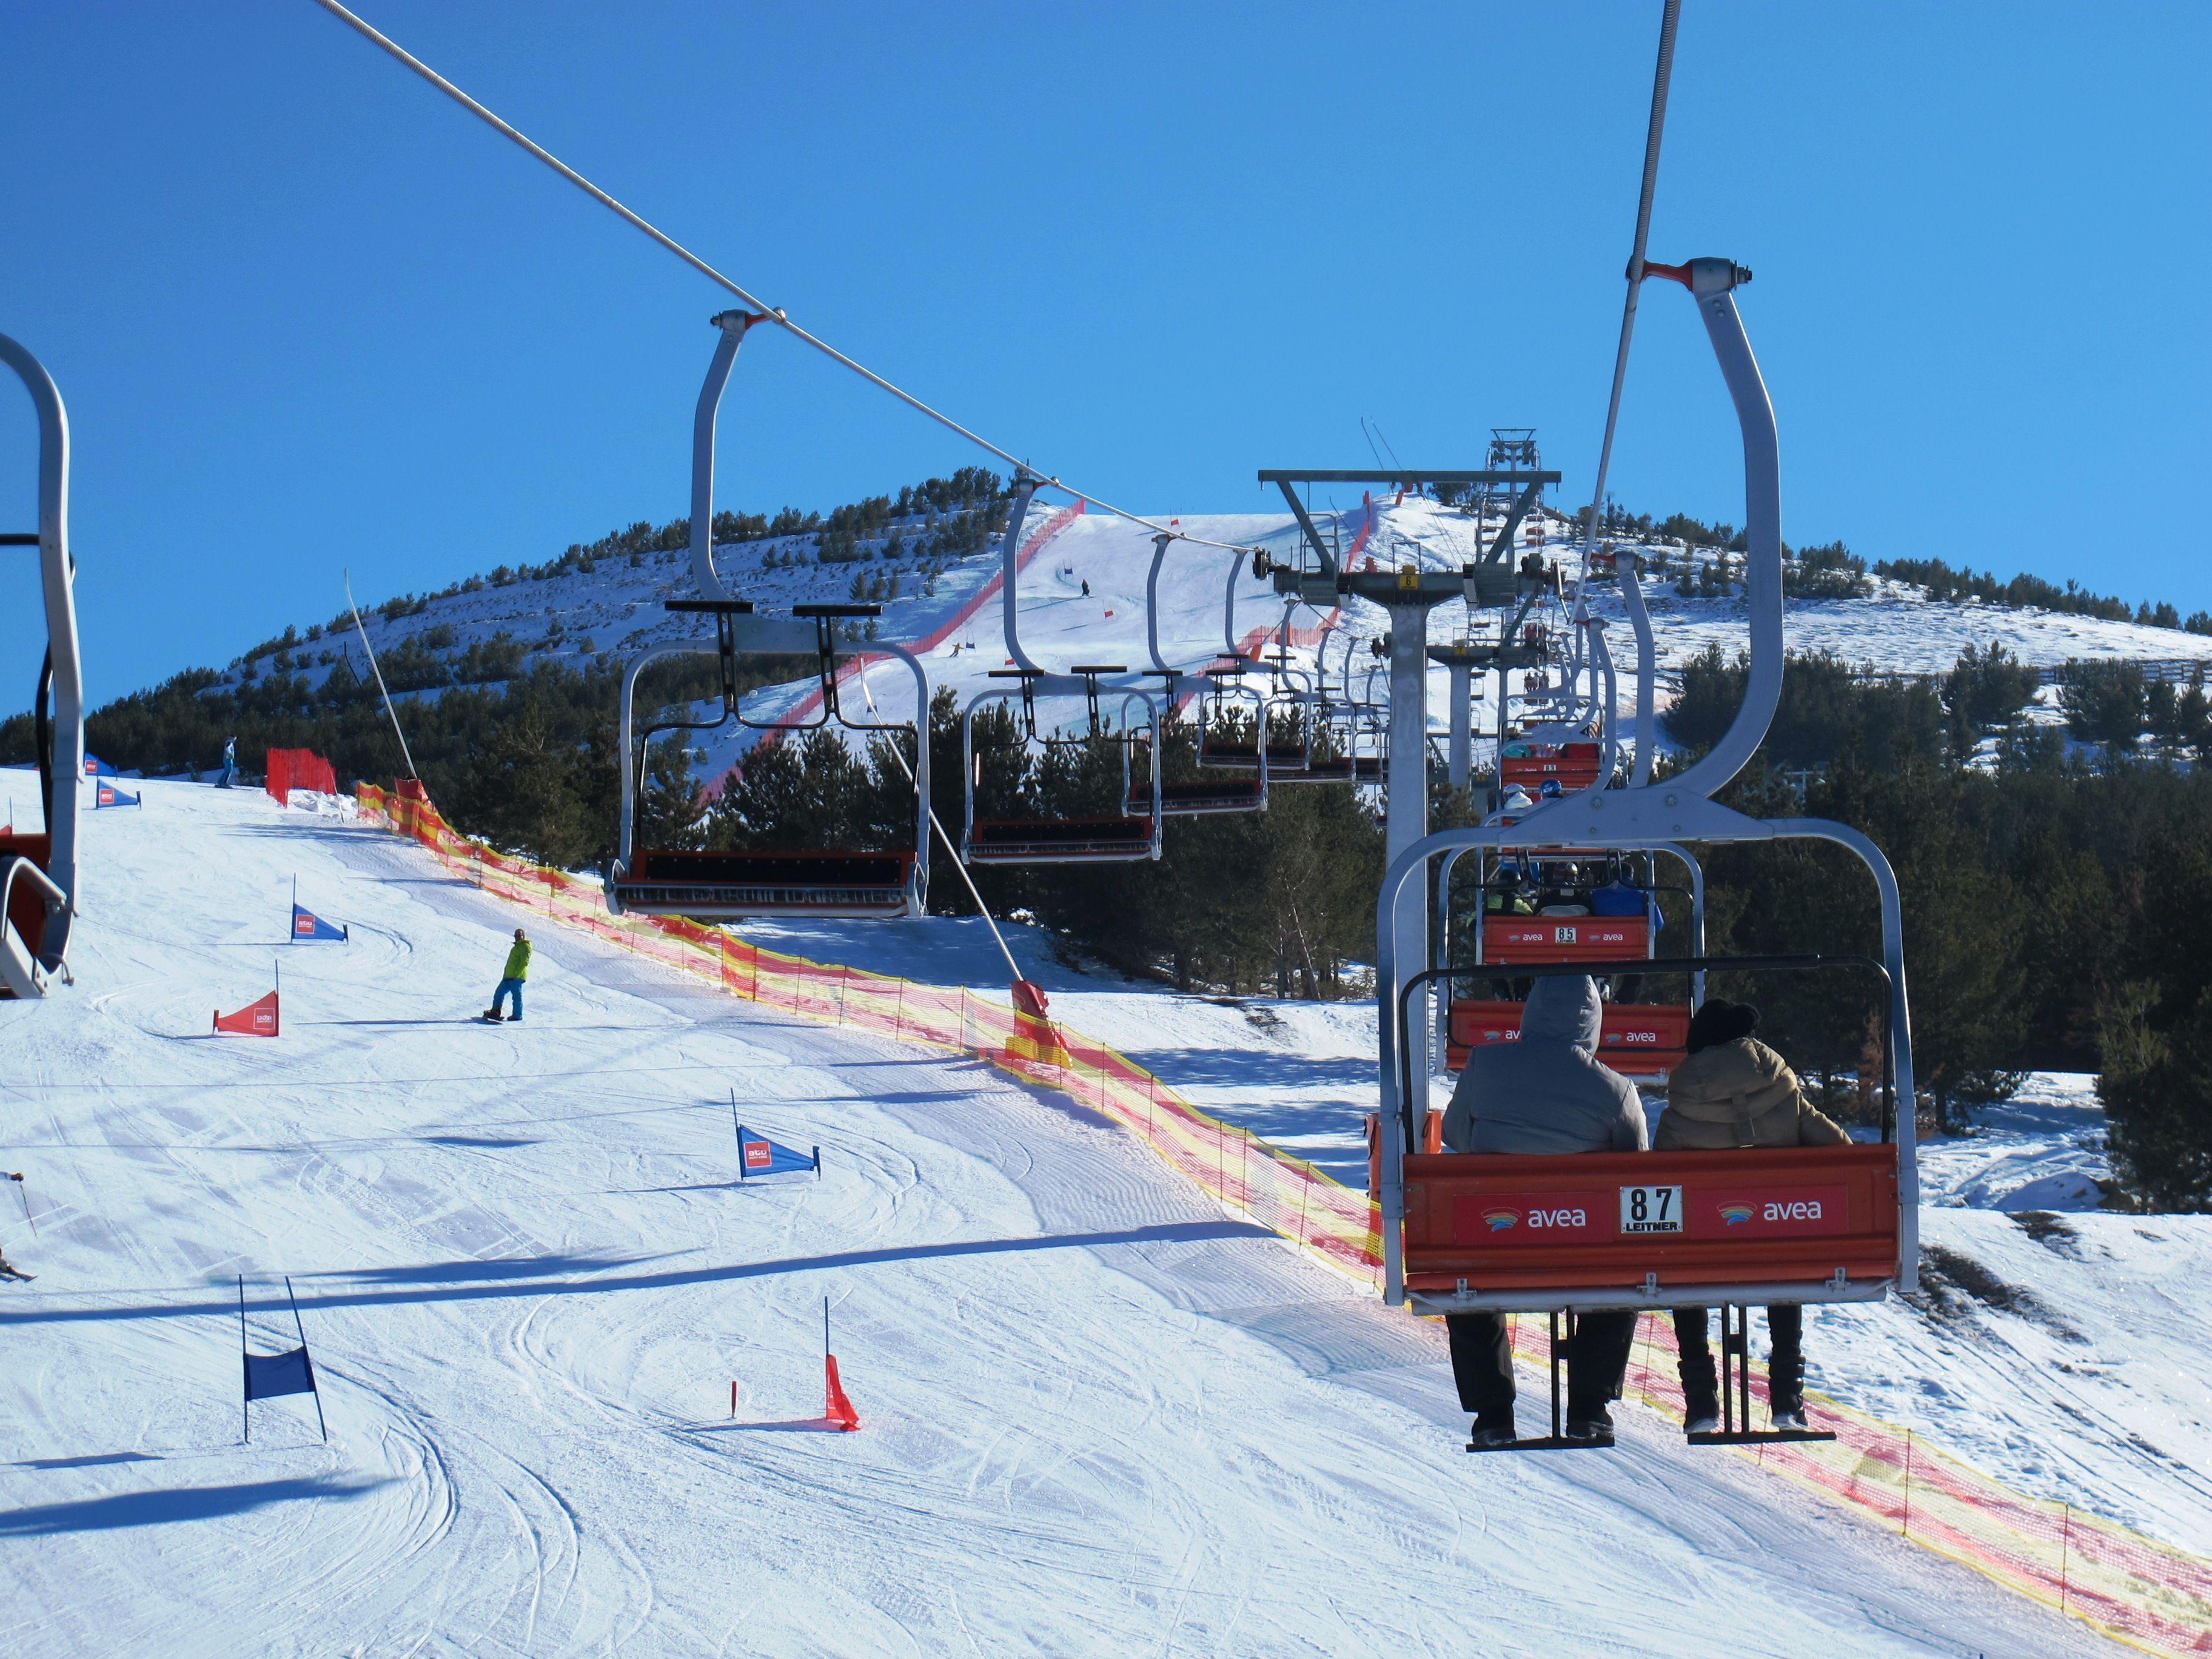 palandoken ski resort, erzurum mount palandoken ski holiday, mt